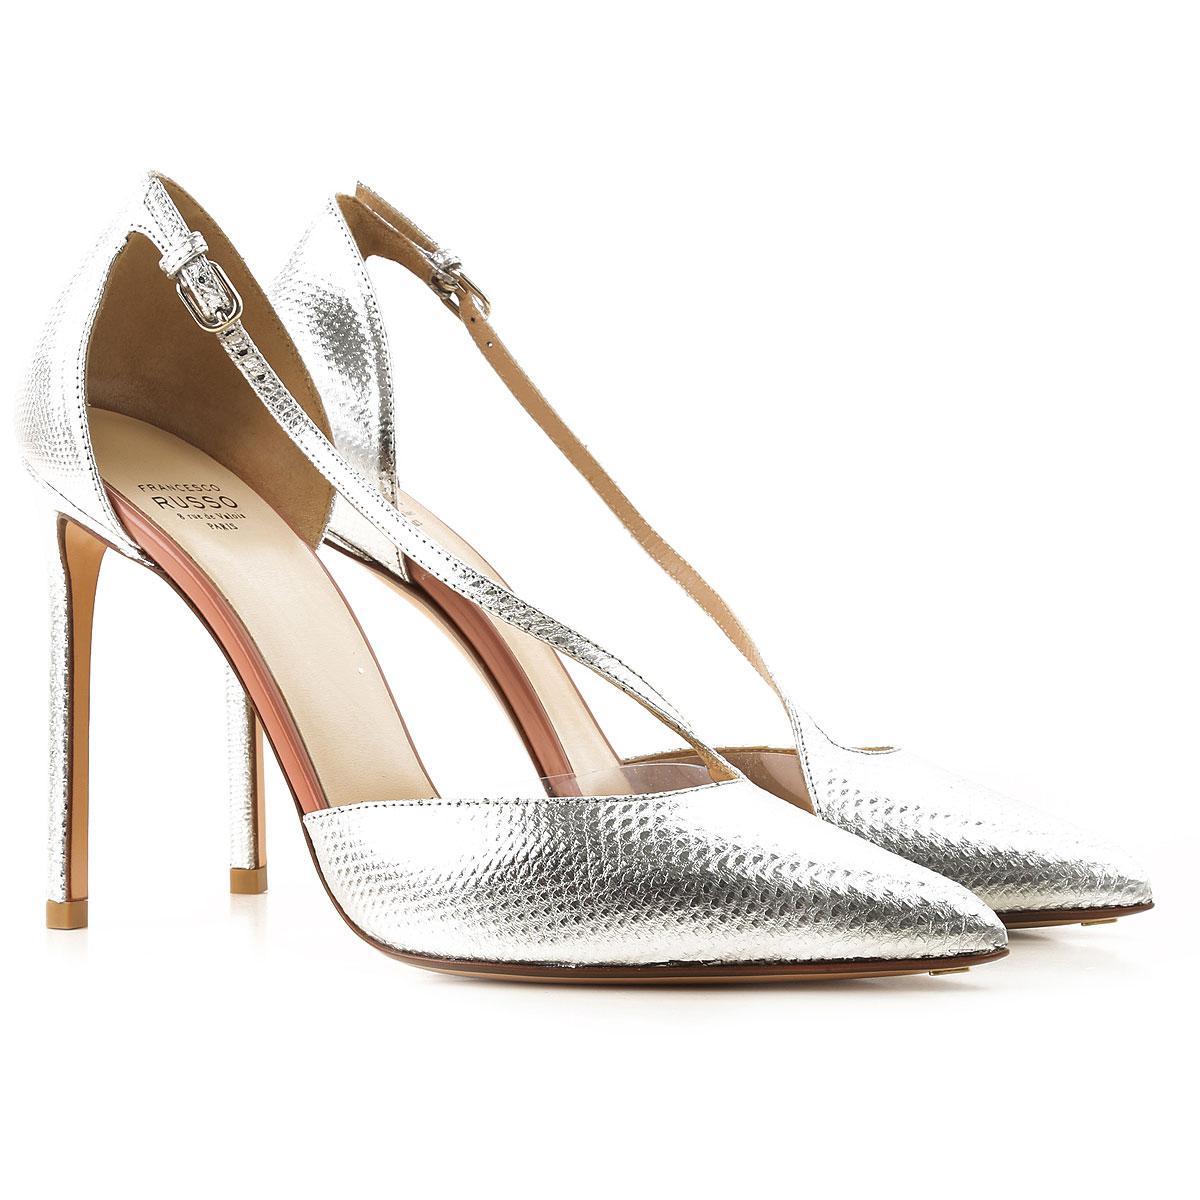 3b66c9d4371 Lyst - Francesco Russo Pumps   High Heels For Women On Sale in Metallic